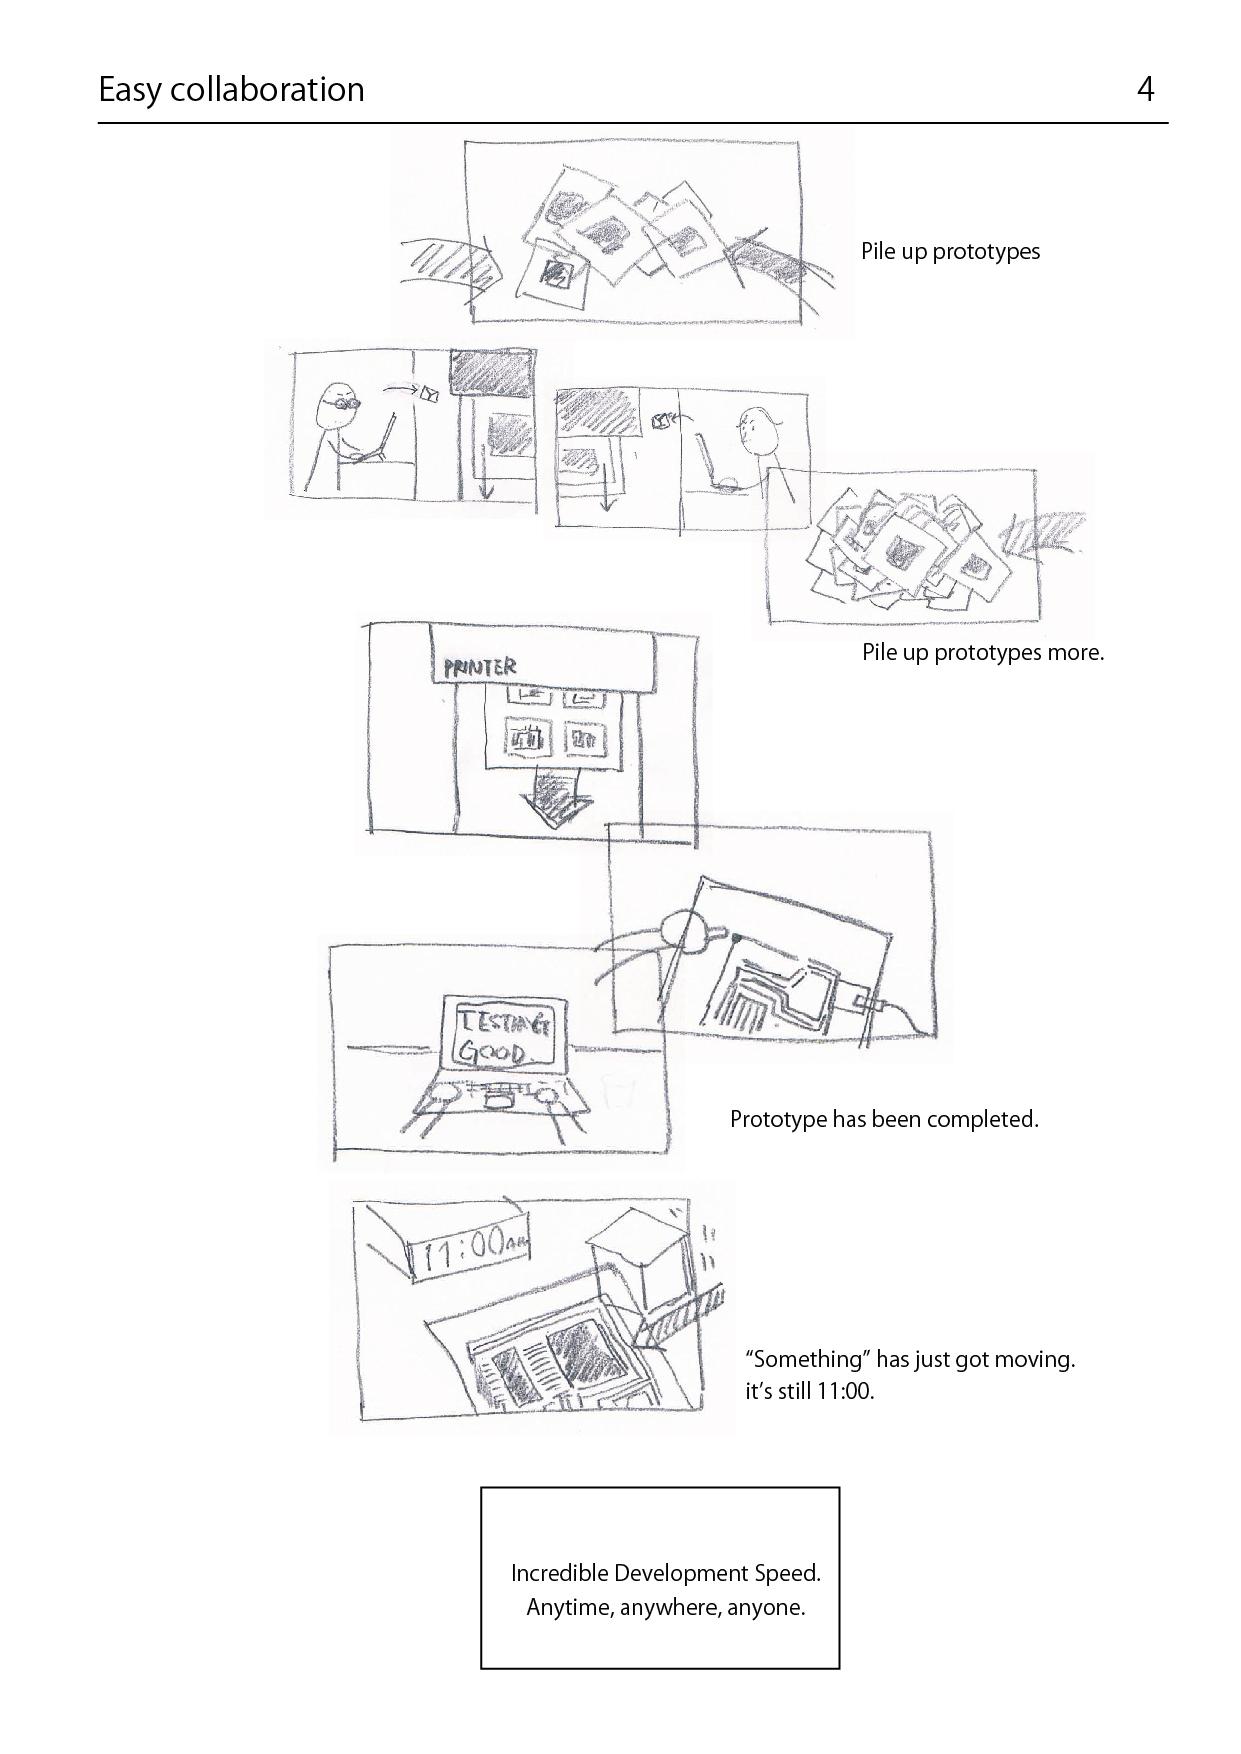 storyboard_easy-c_04